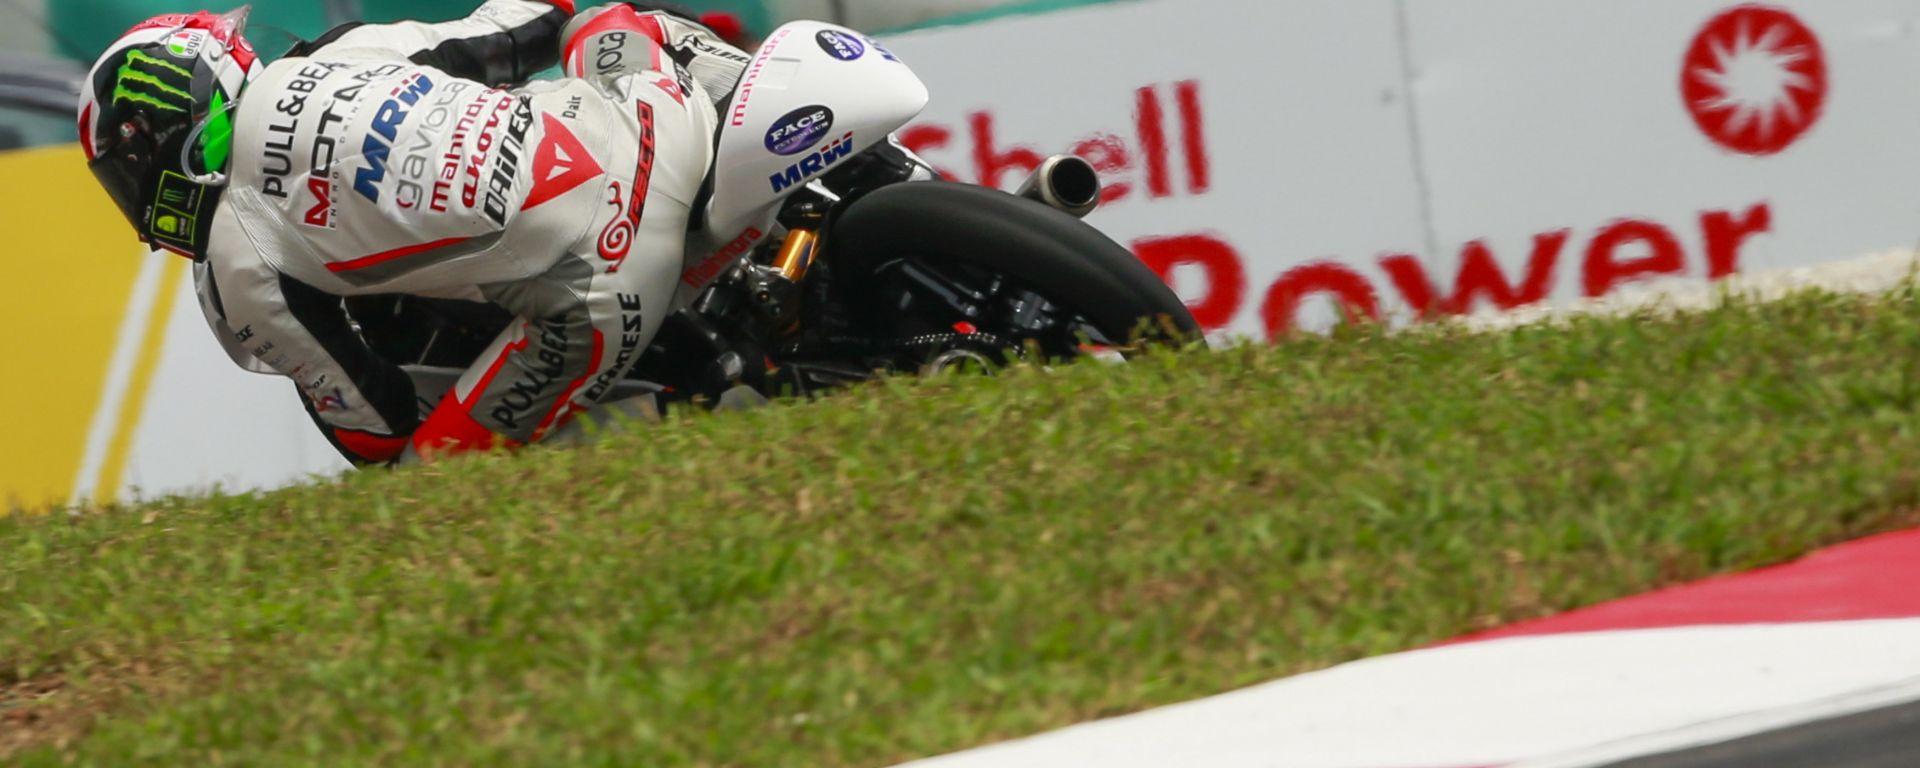 MOTO 3 SEPANG 2016: FRANCESCO BAGNAIA TRIONFA IN UNA GARA AD ELIMINAZIONE